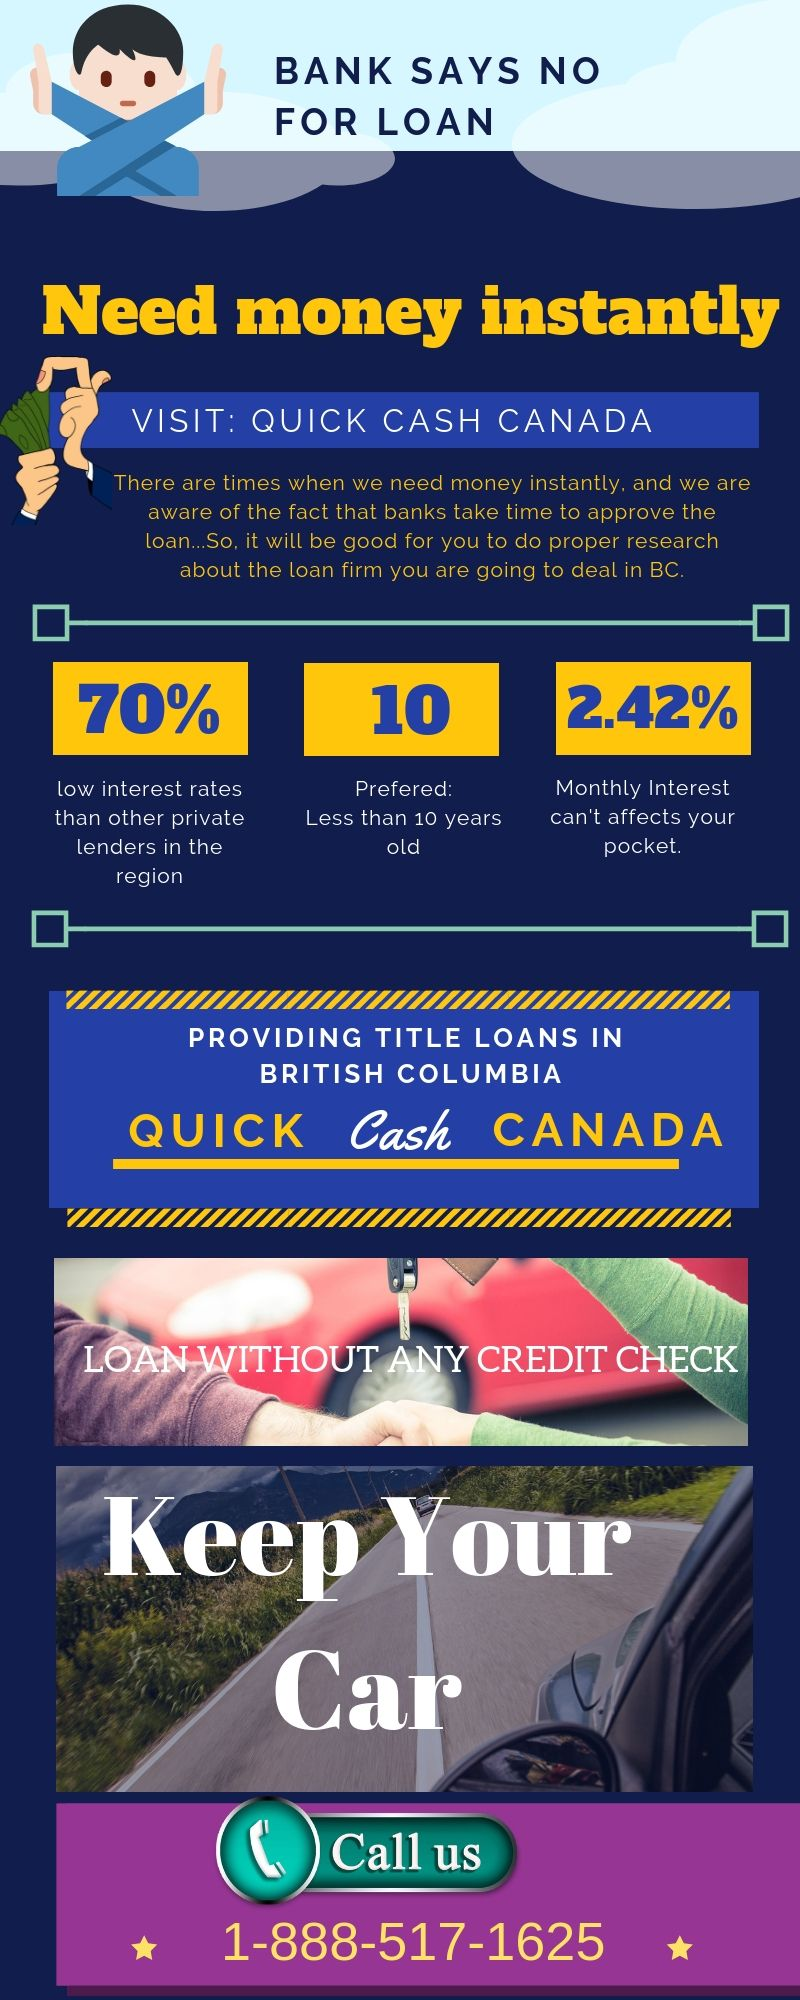 Quick Cash Canada is providing instant money through Car